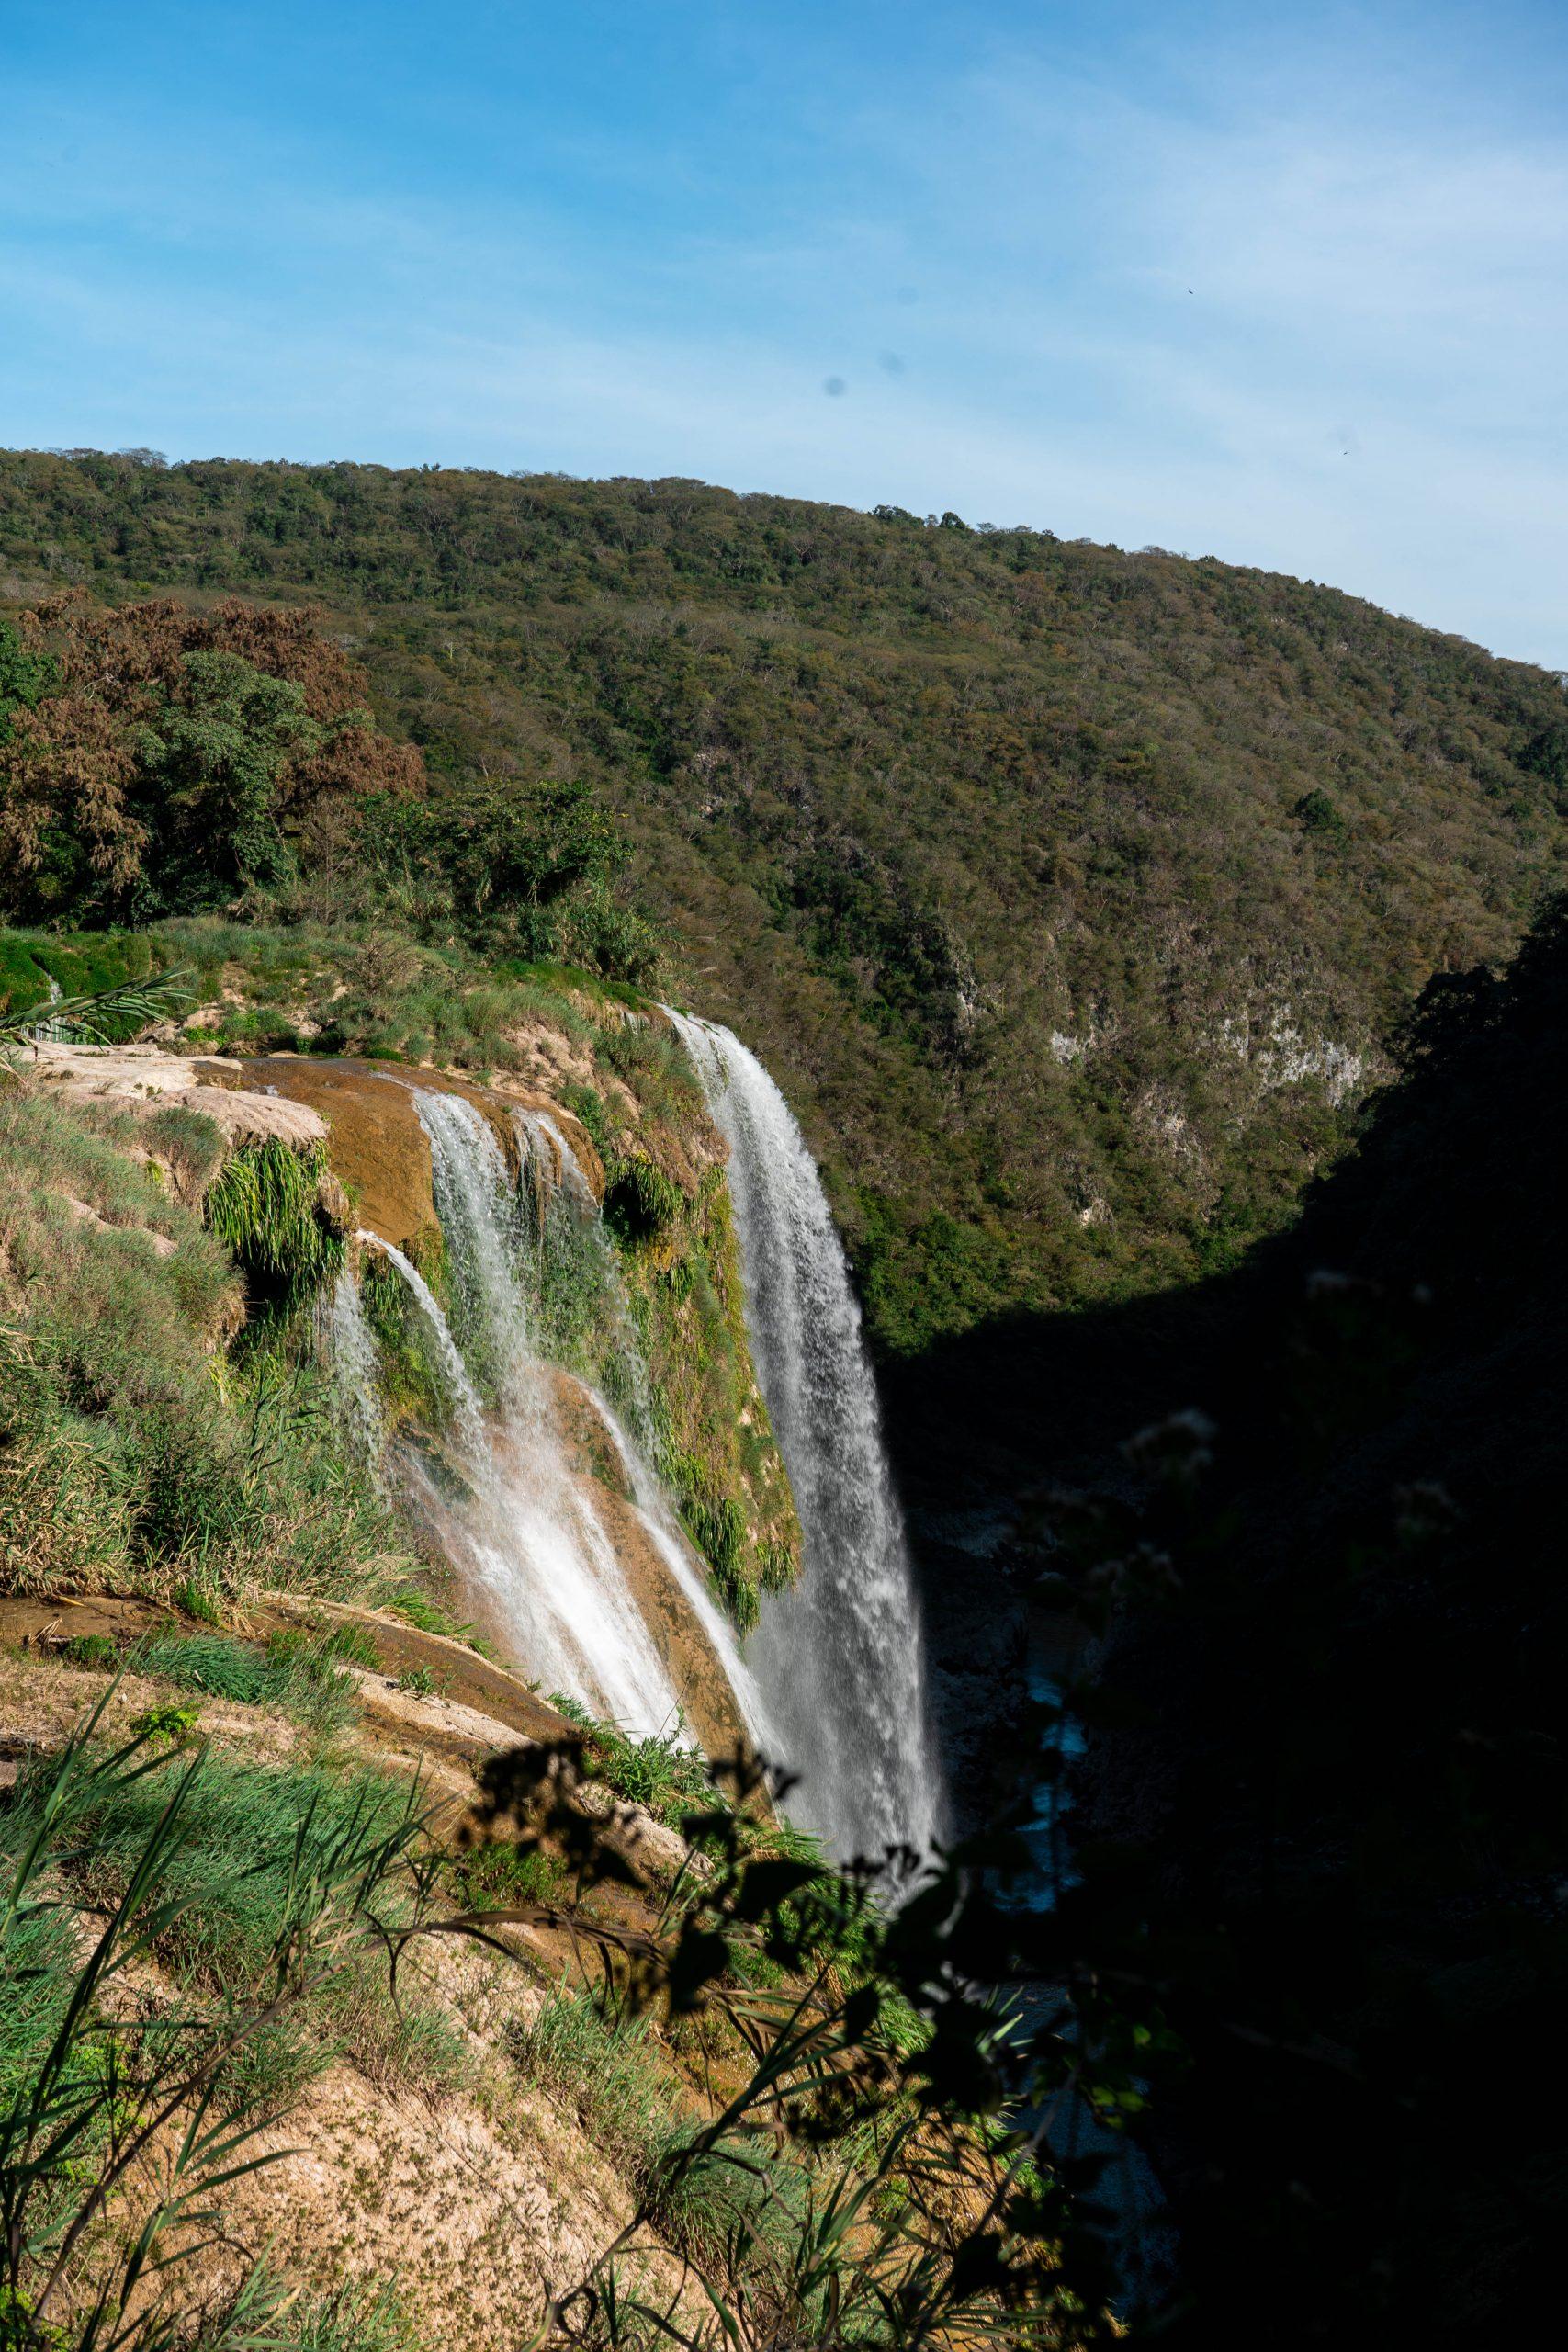 cascada de tamul waterfall overlook lookout point hiking canyon huasteca potosina san luis potosi mexico